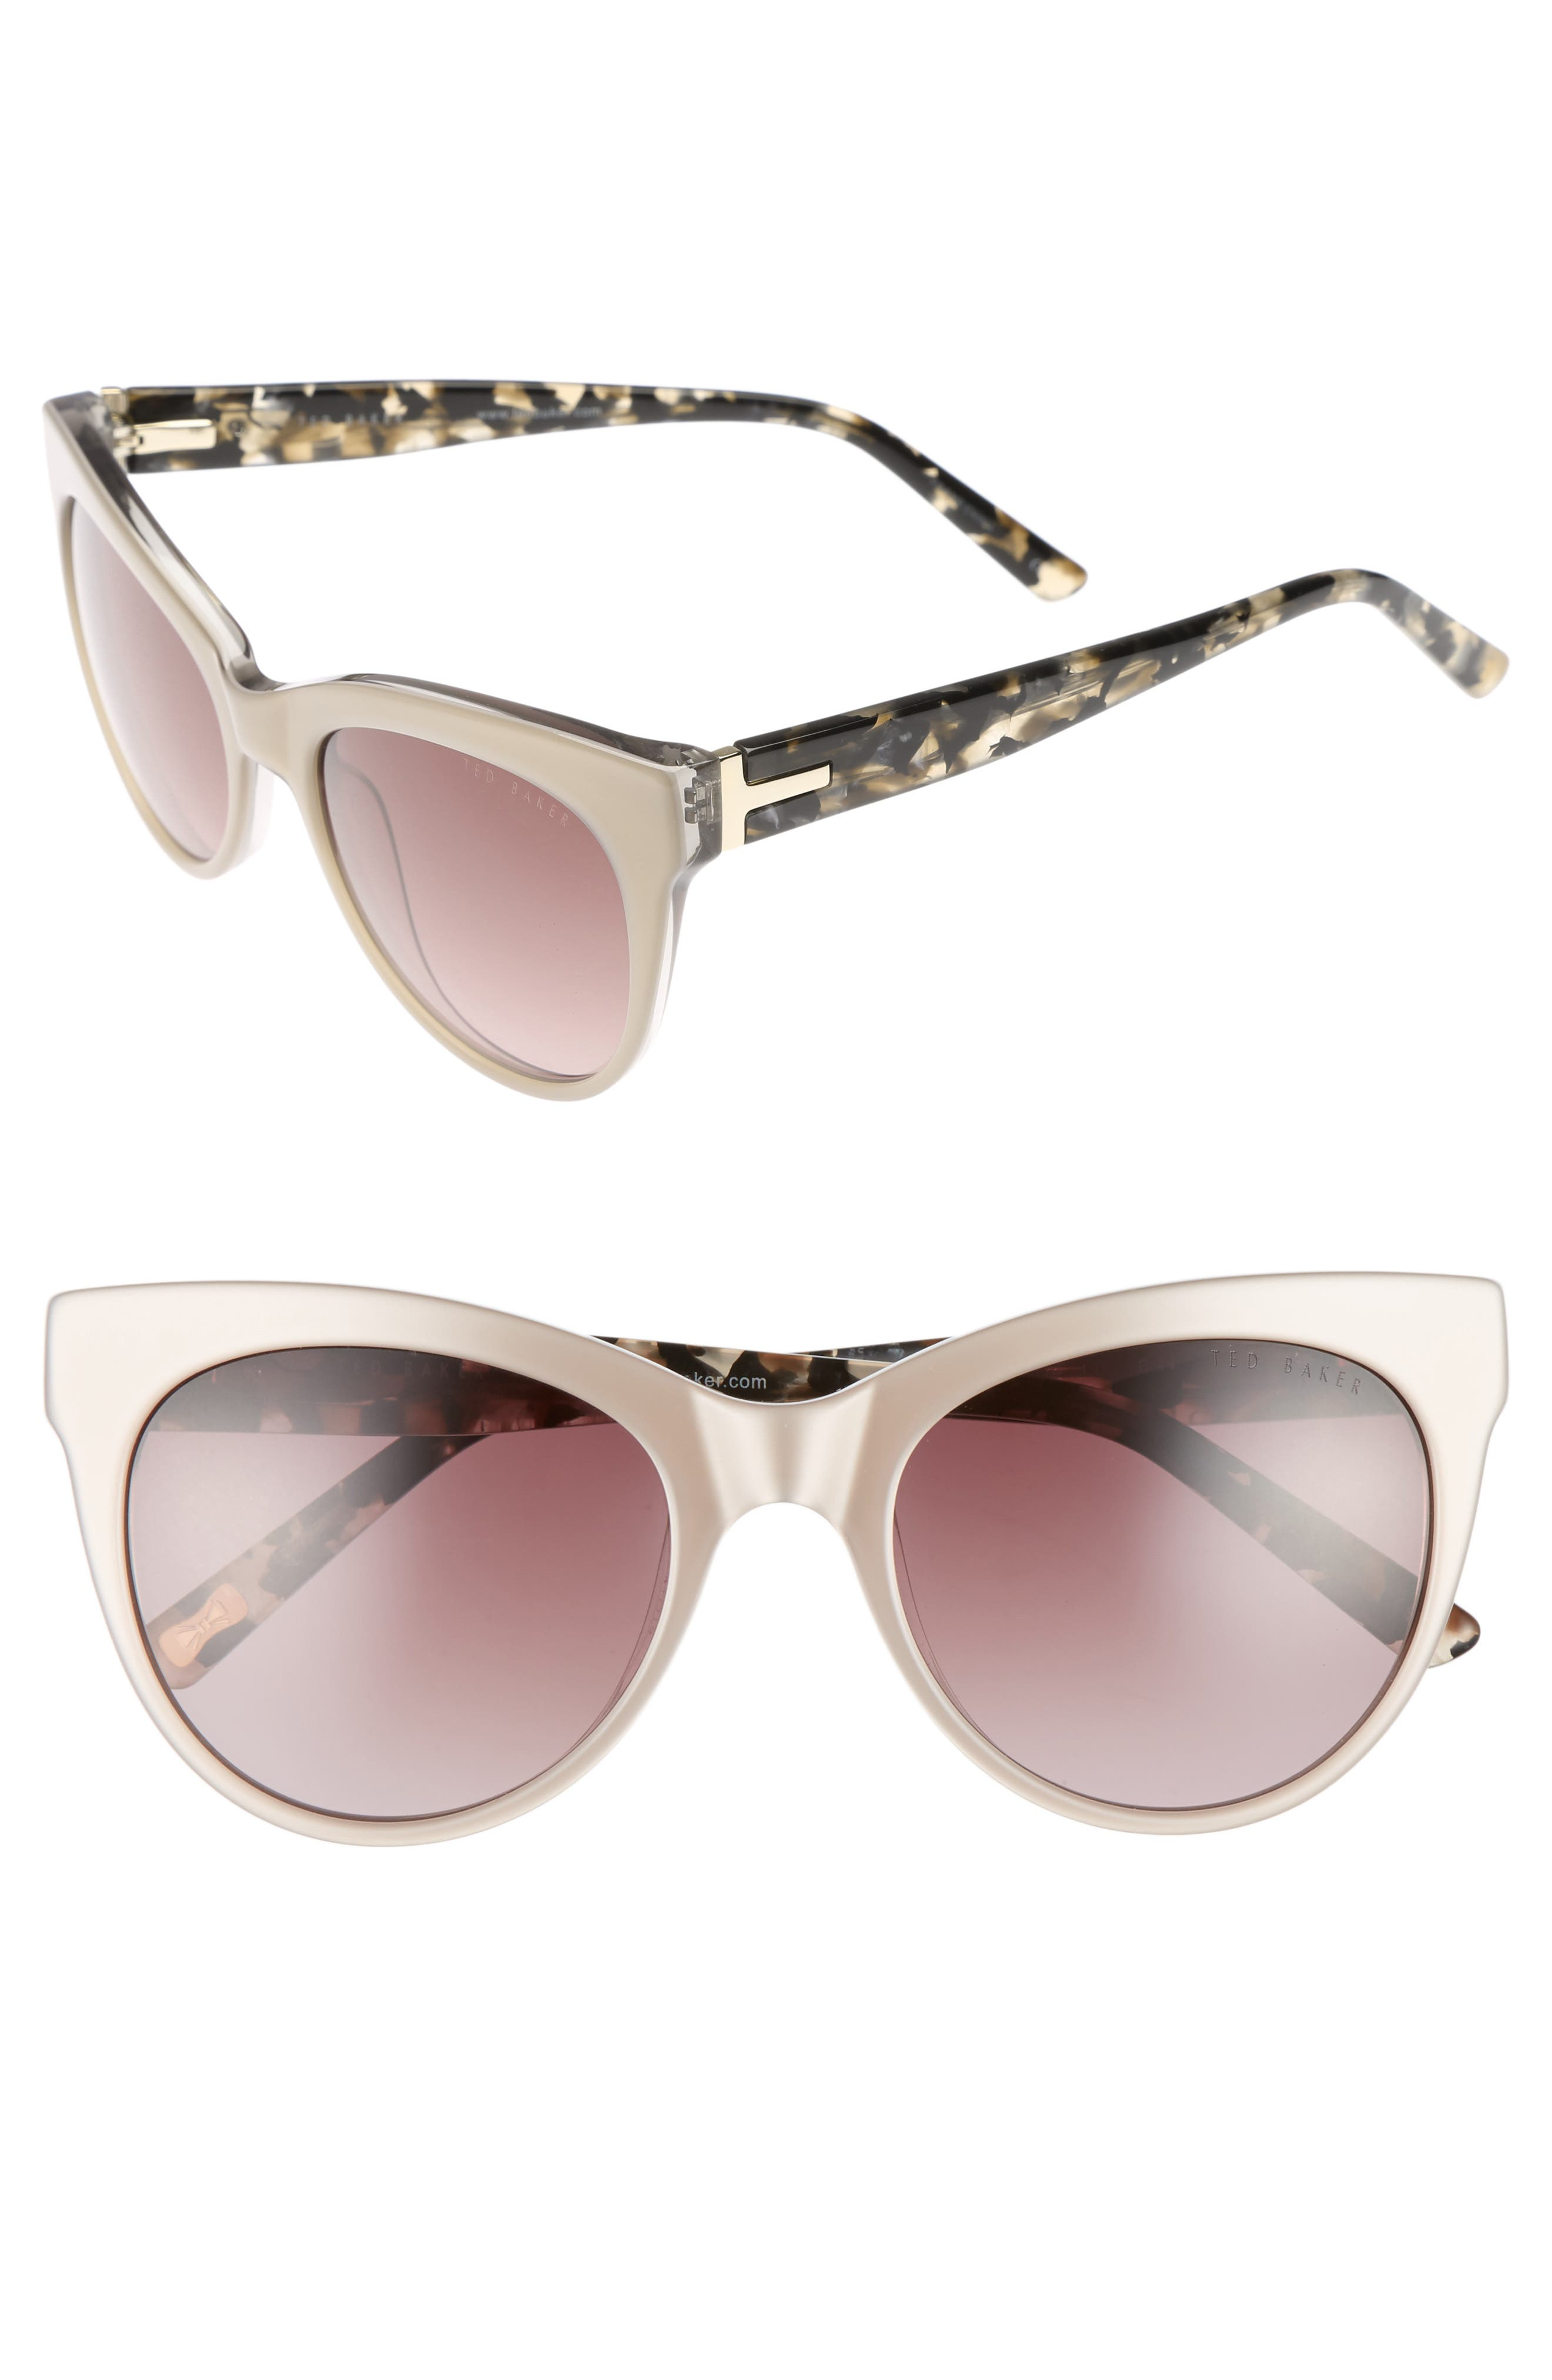 51mm Cat Eye Sunglasses,                         Main,                         color, 200